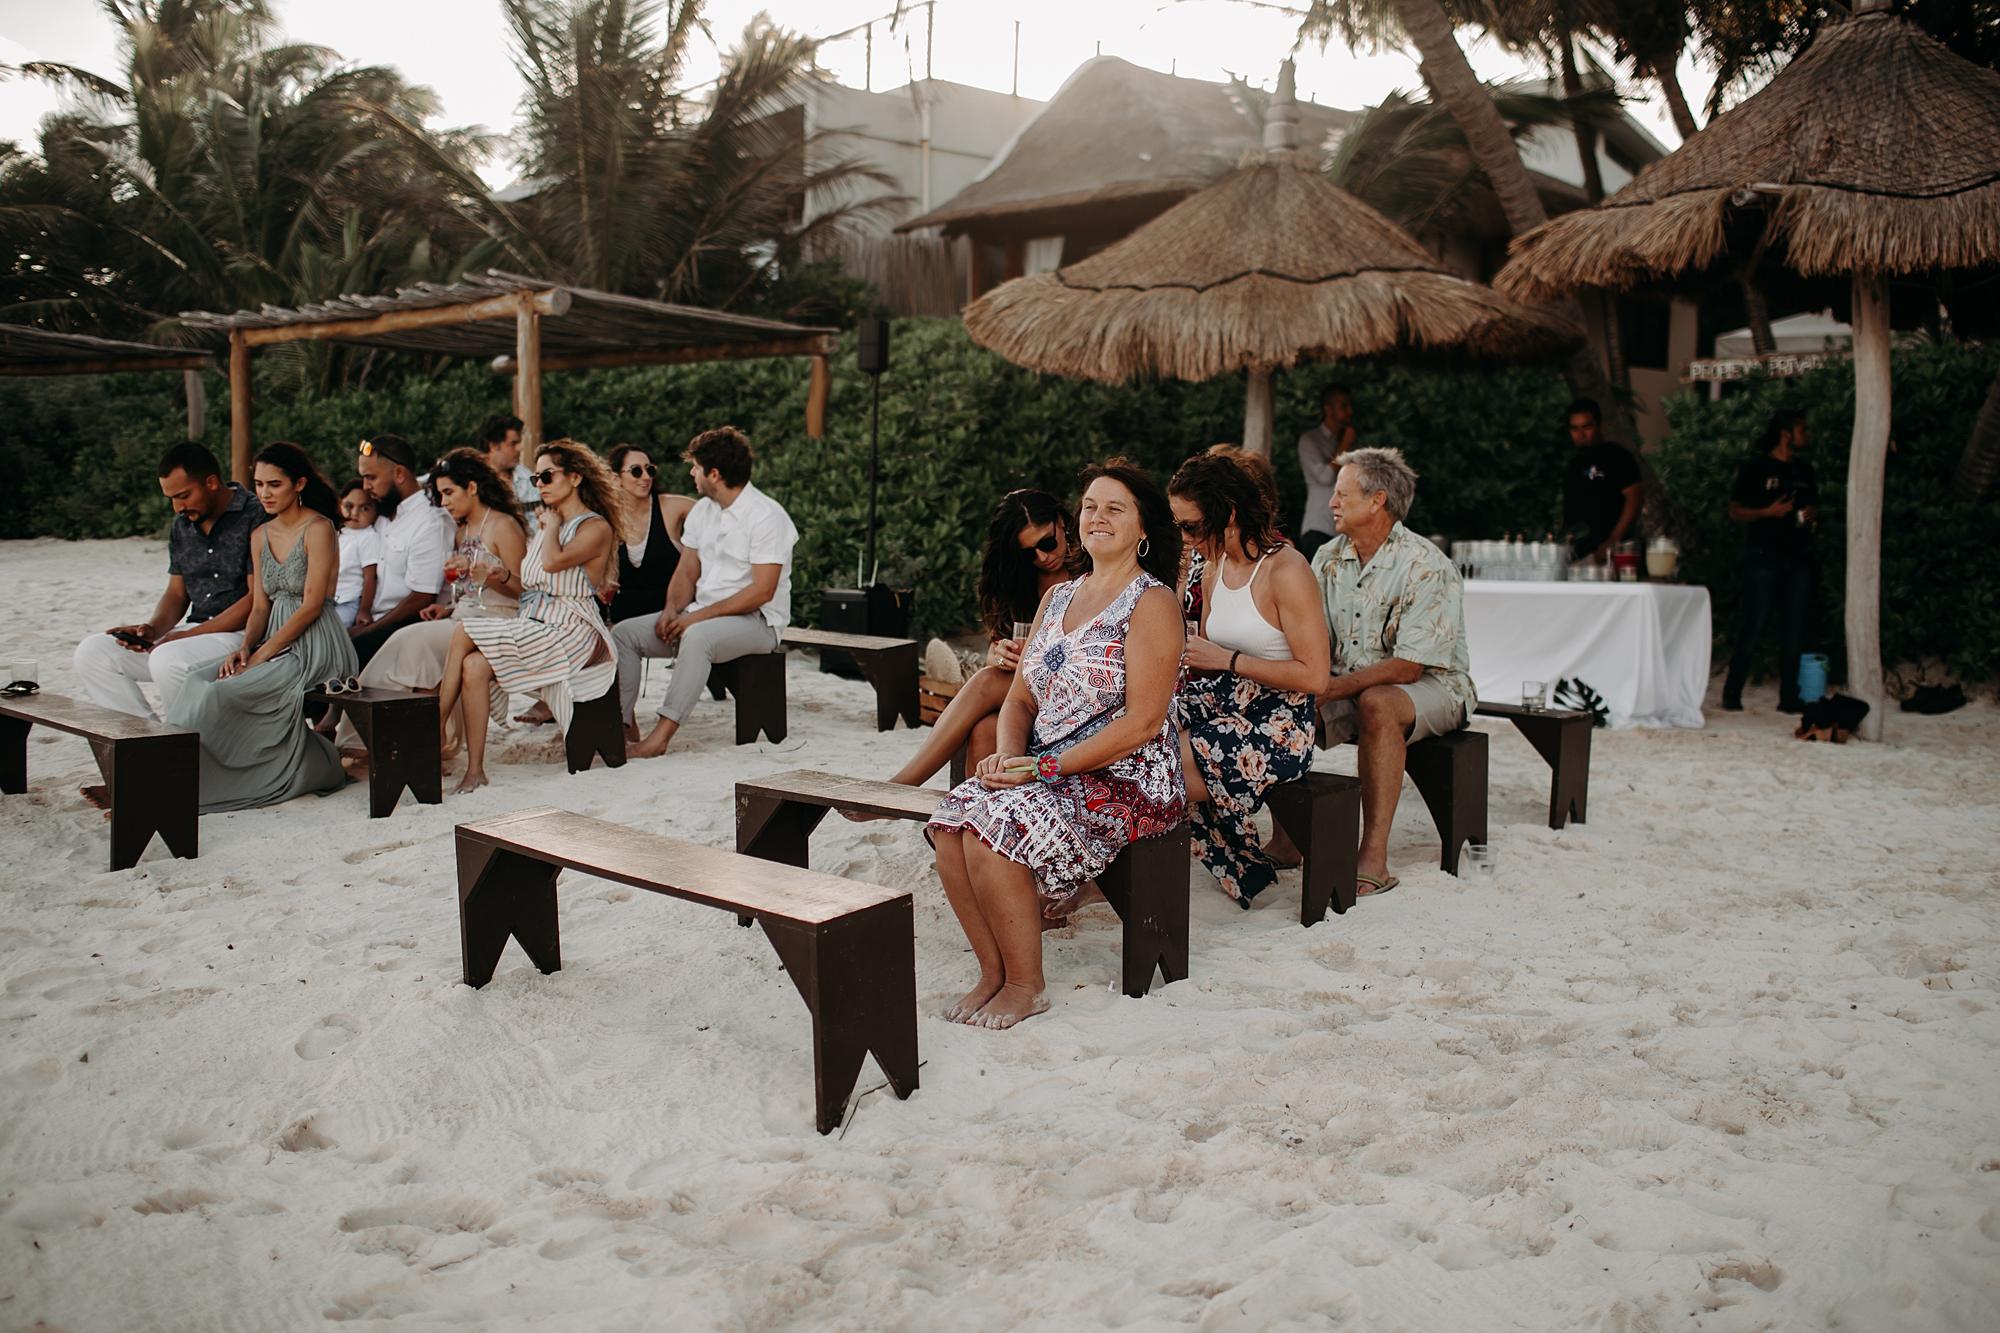 Danielle-San-Antonio-Wedding-Photographer-139_WEB.jpg